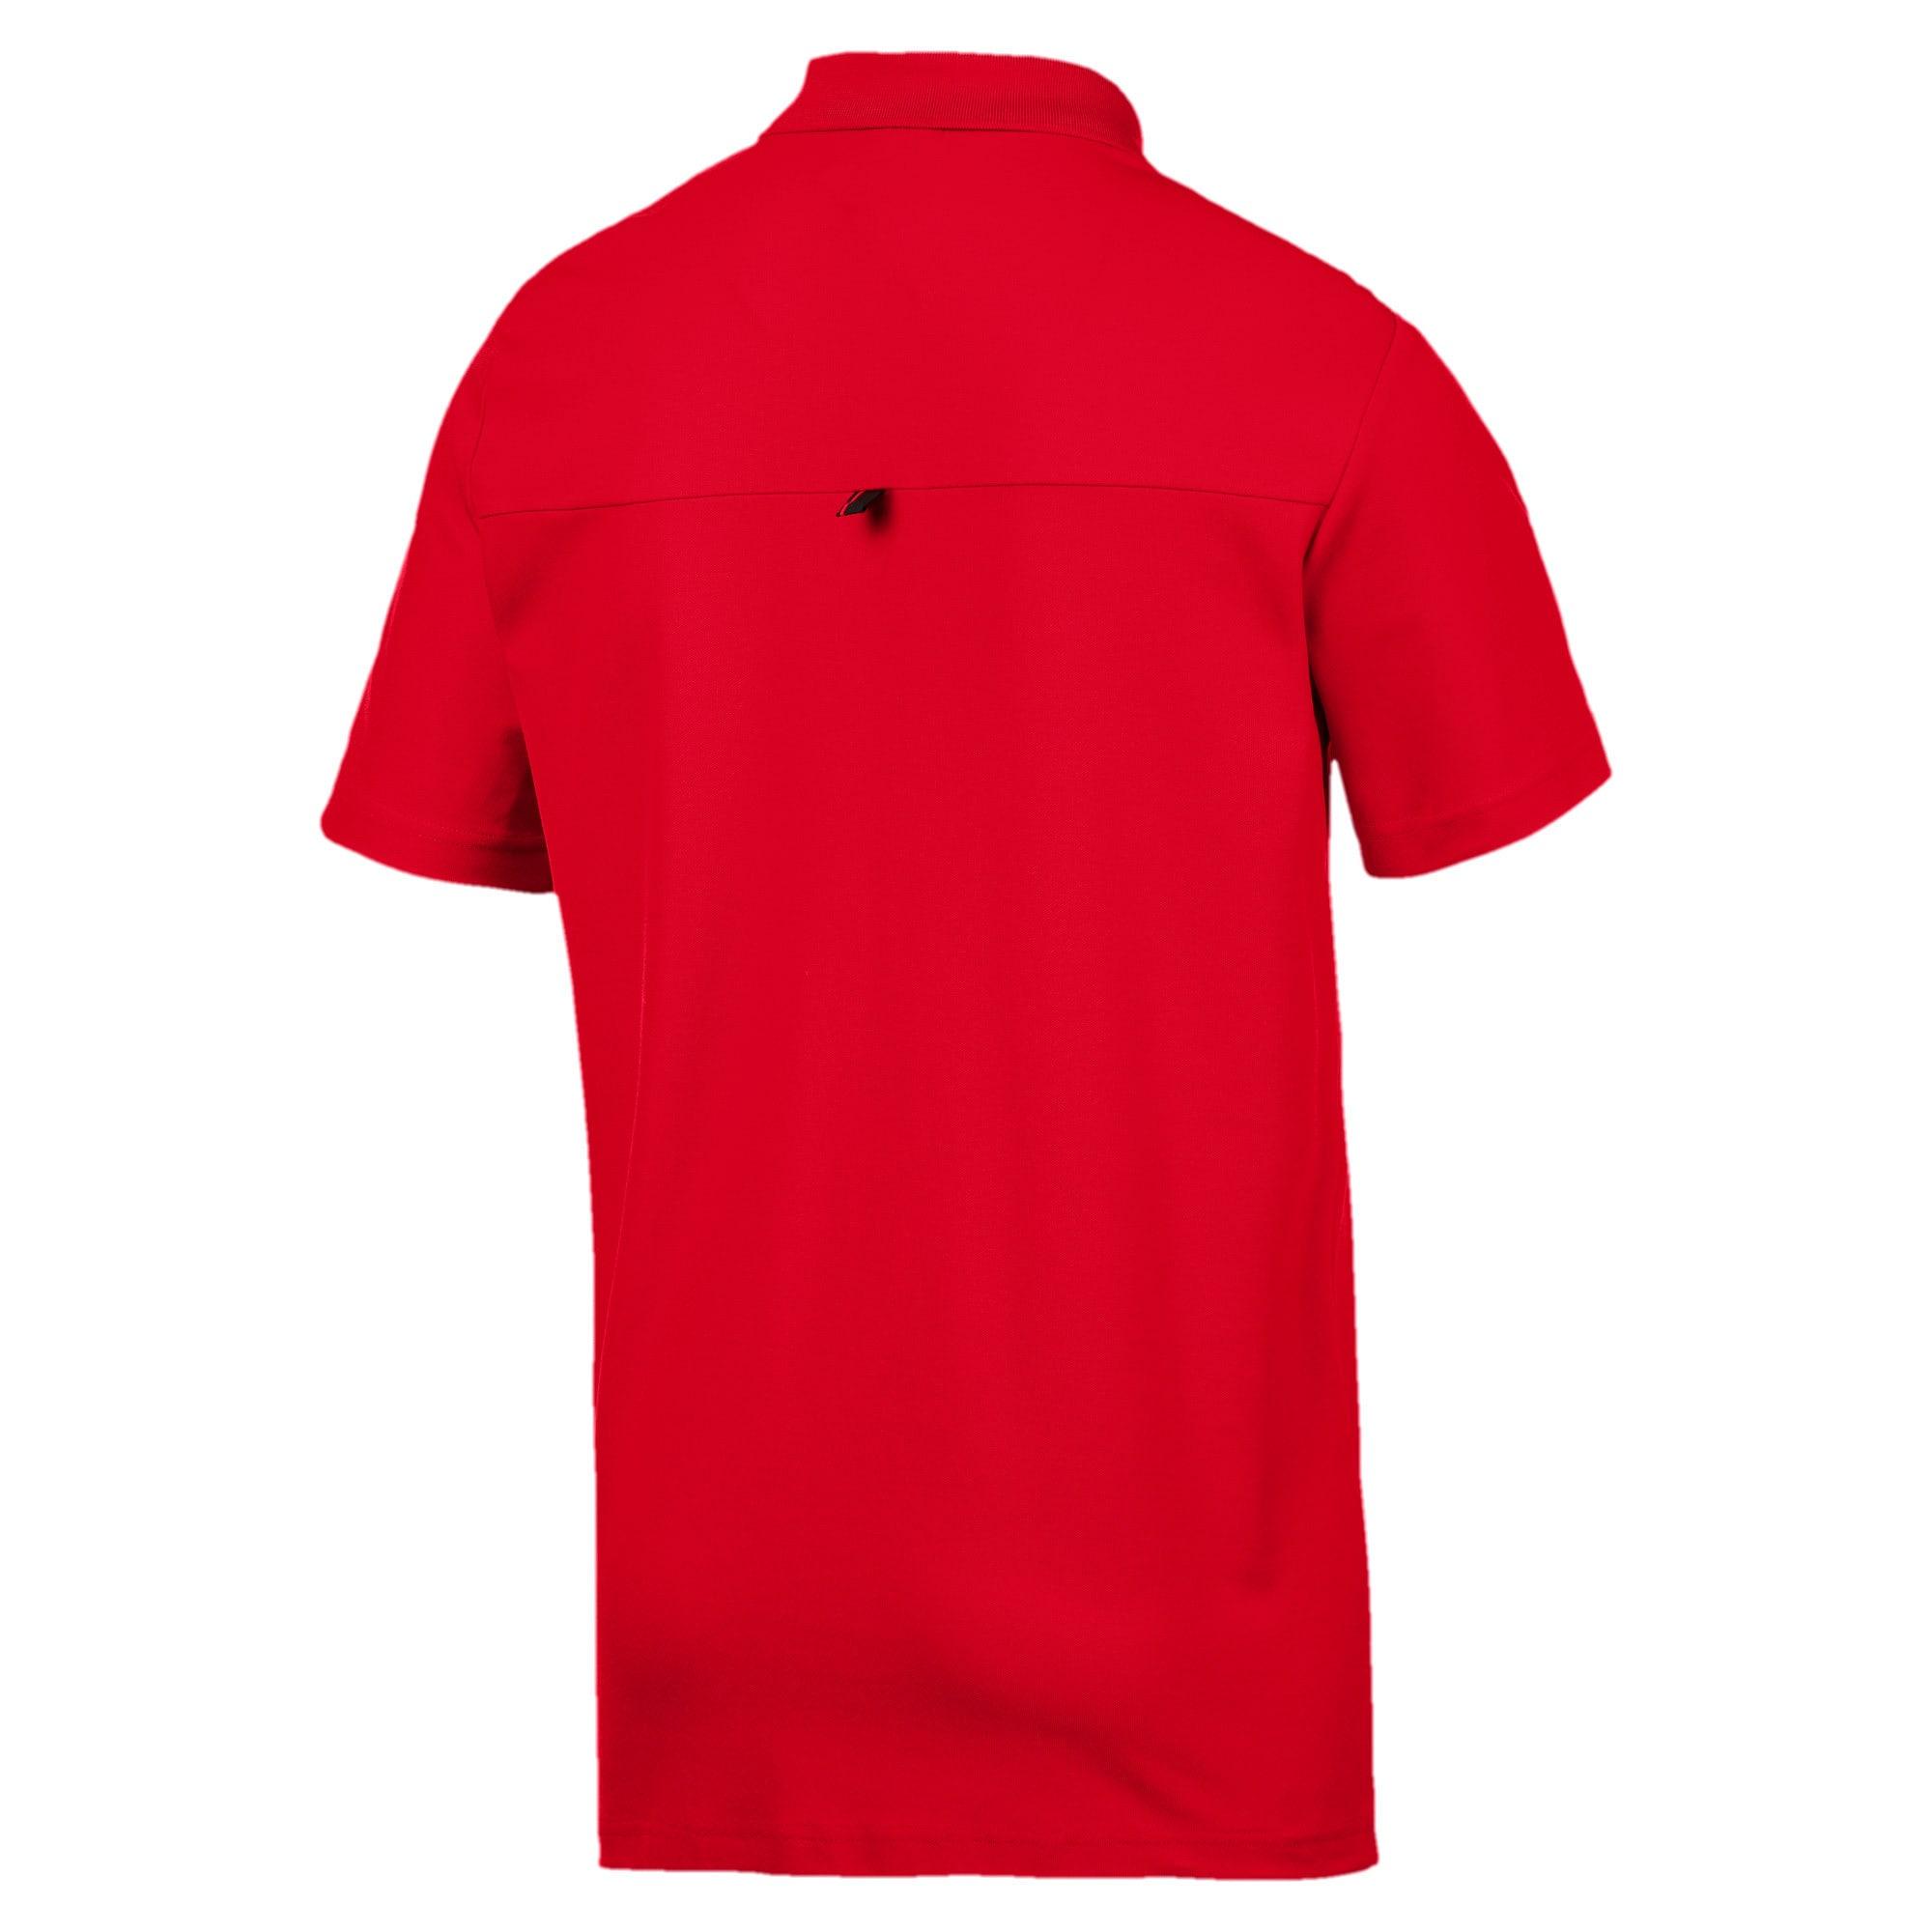 Thumbnail 6 of Ferrari Men's Polo Shirt, Rosso Corsa, medium